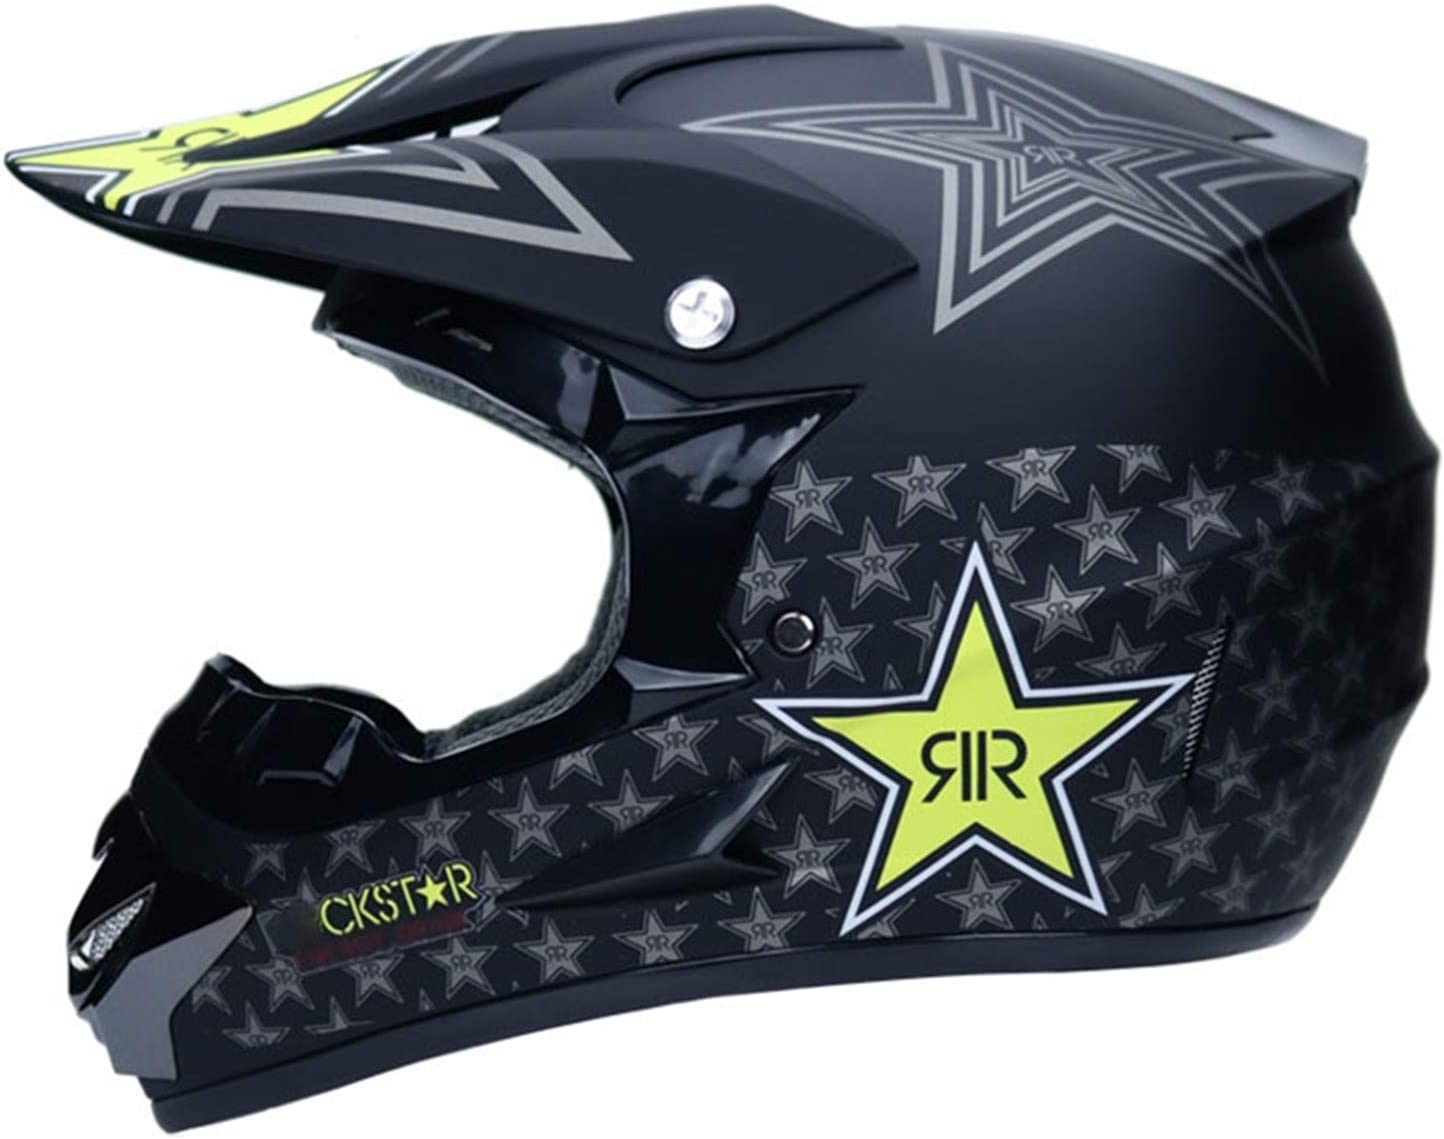 OFFer Motocross Helmet Offroad Gear Combo Goggles Gloves In a popularity Mask ATV Moto